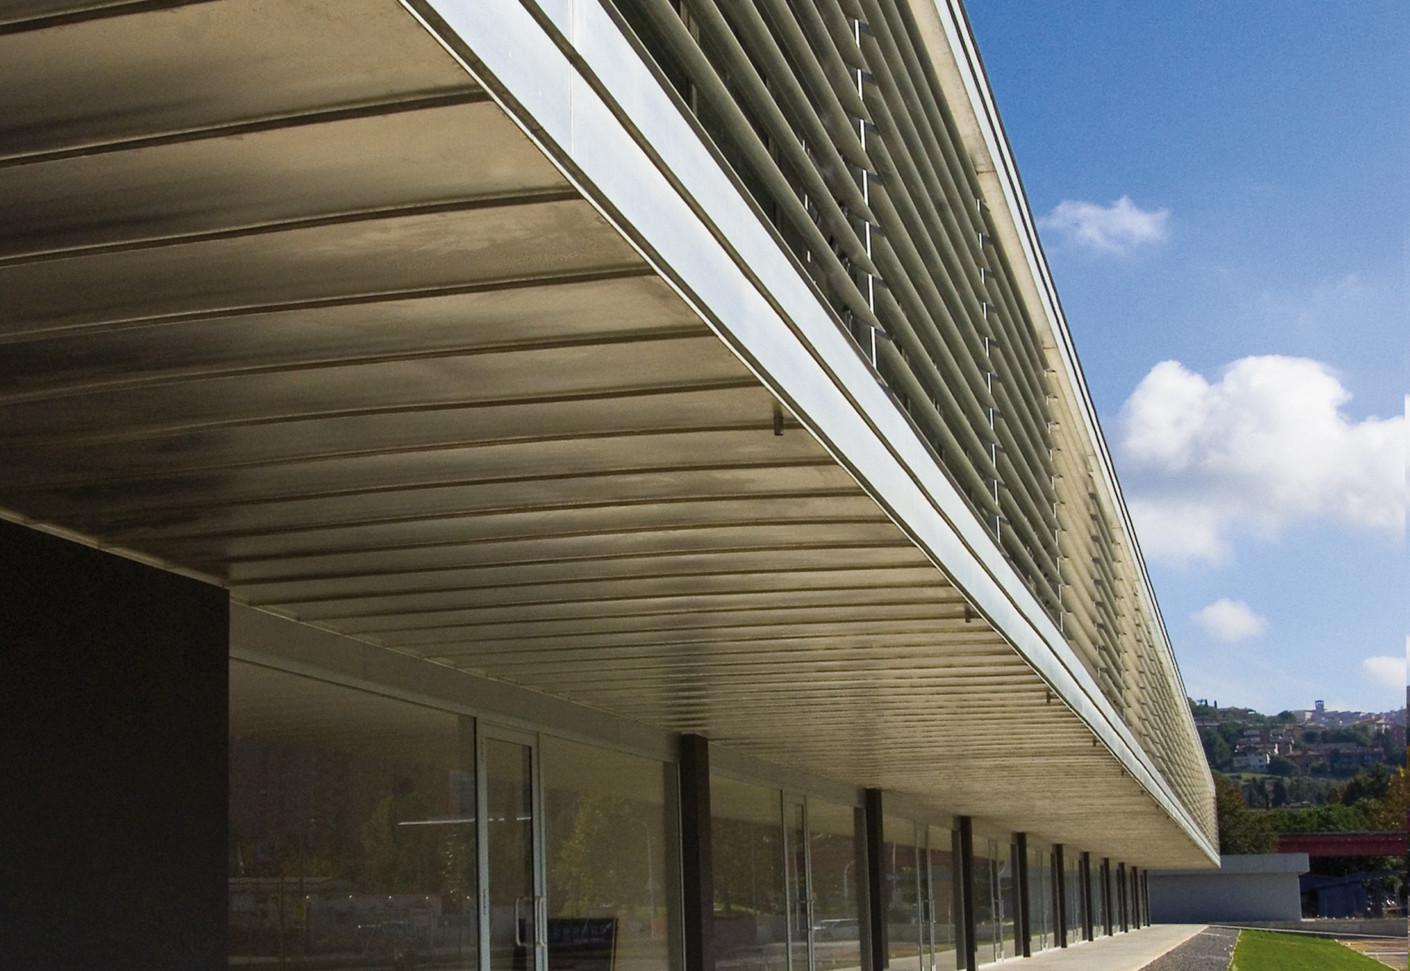 Tecu 174 Zinn Panels With Solar Shading Lamellas By Kme